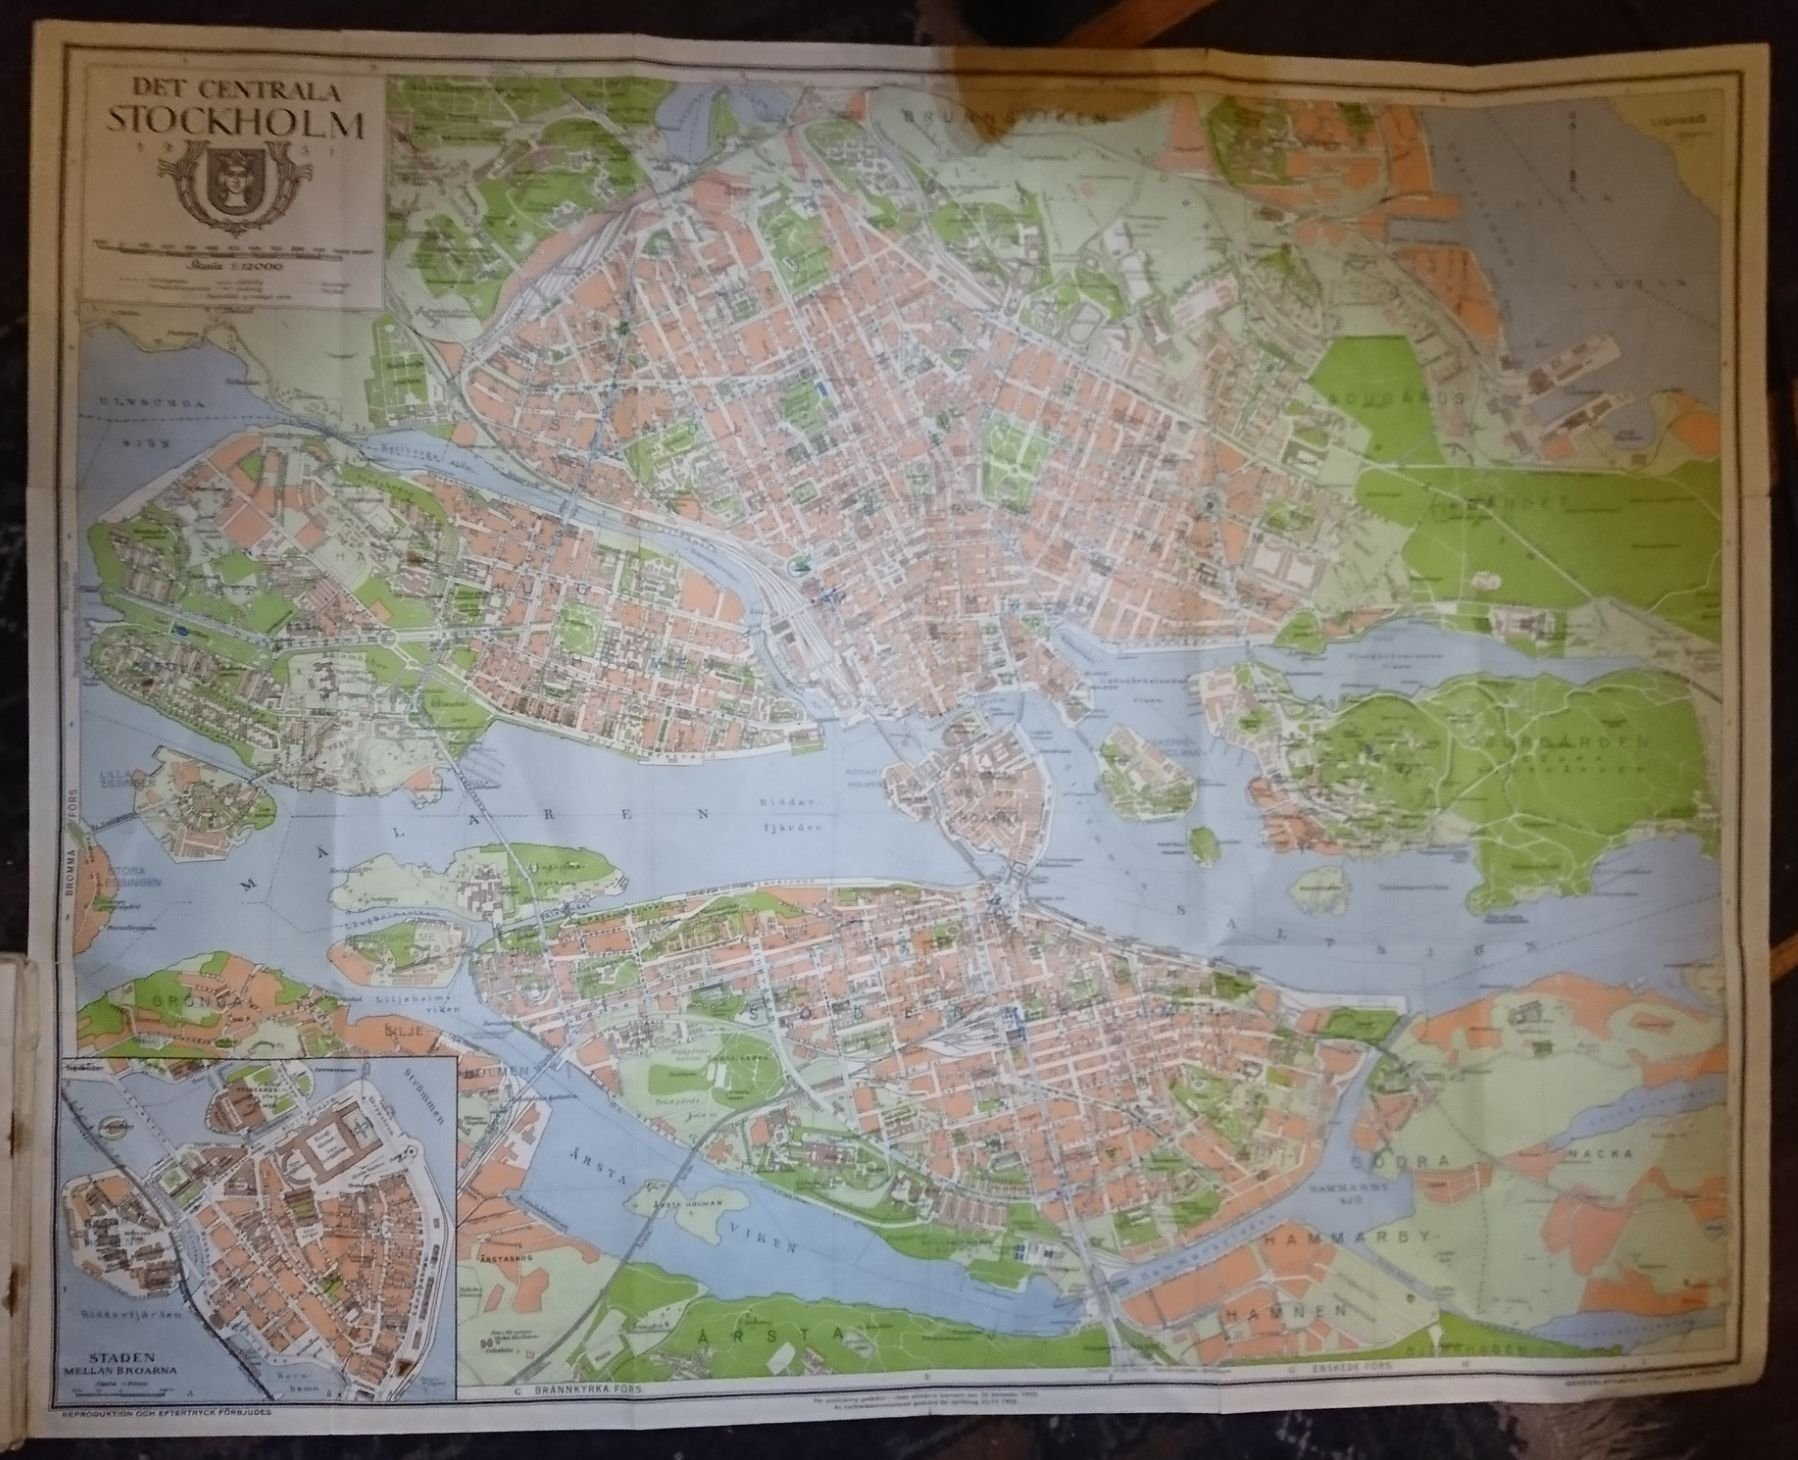 Storre Snygg Karta Over Stockholms Innerstad 1 377927943 ᐈ